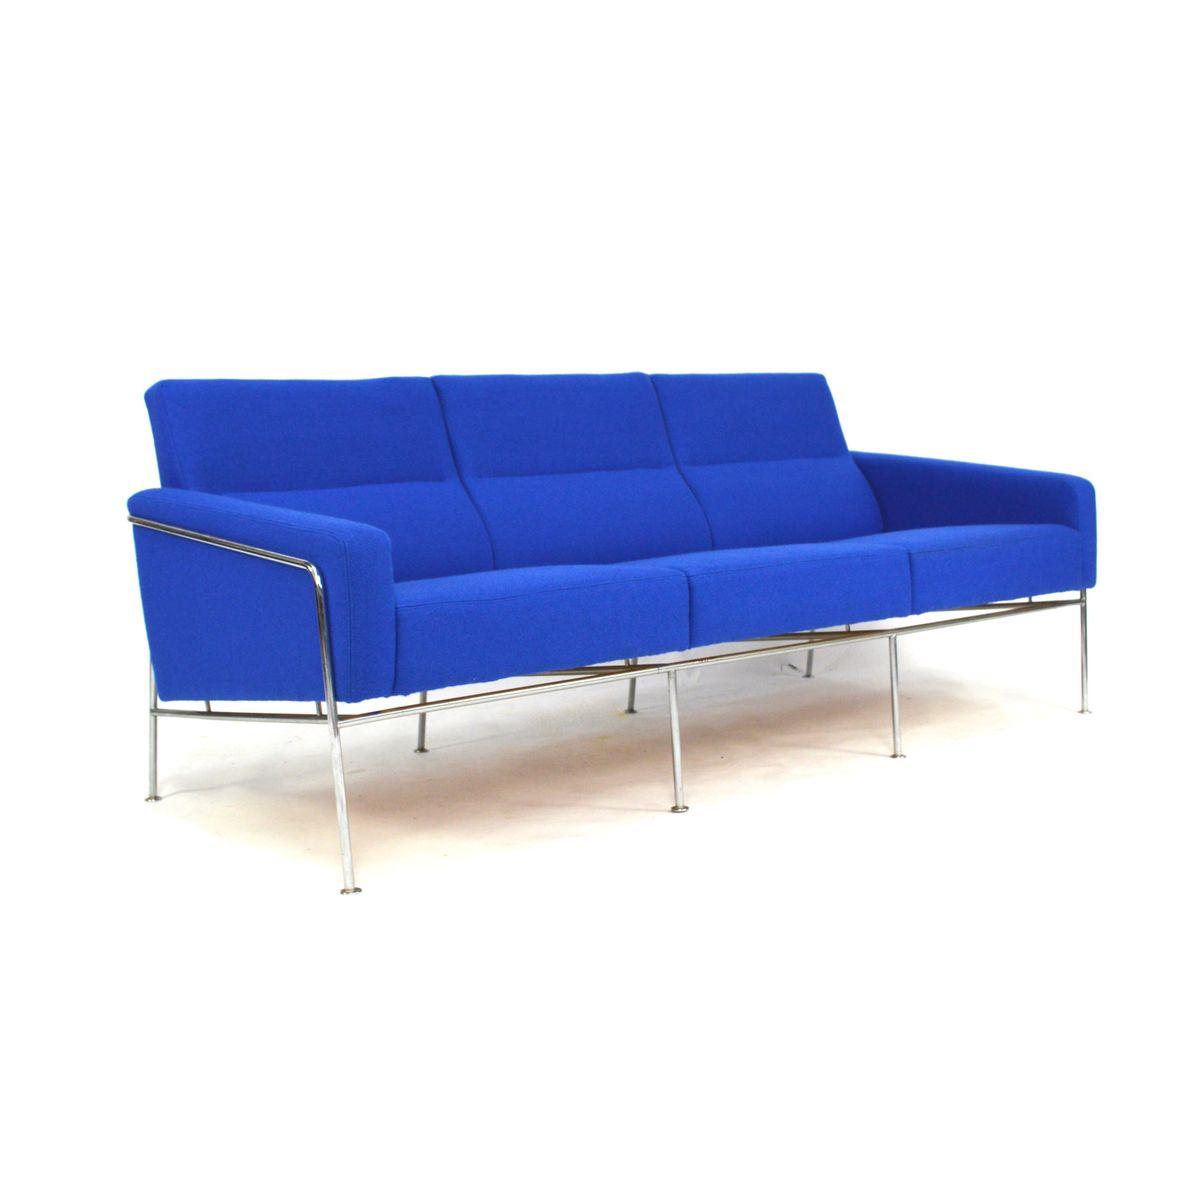 3300 sofa by arne jacobsen for fritz hansen 1970s for. Black Bedroom Furniture Sets. Home Design Ideas